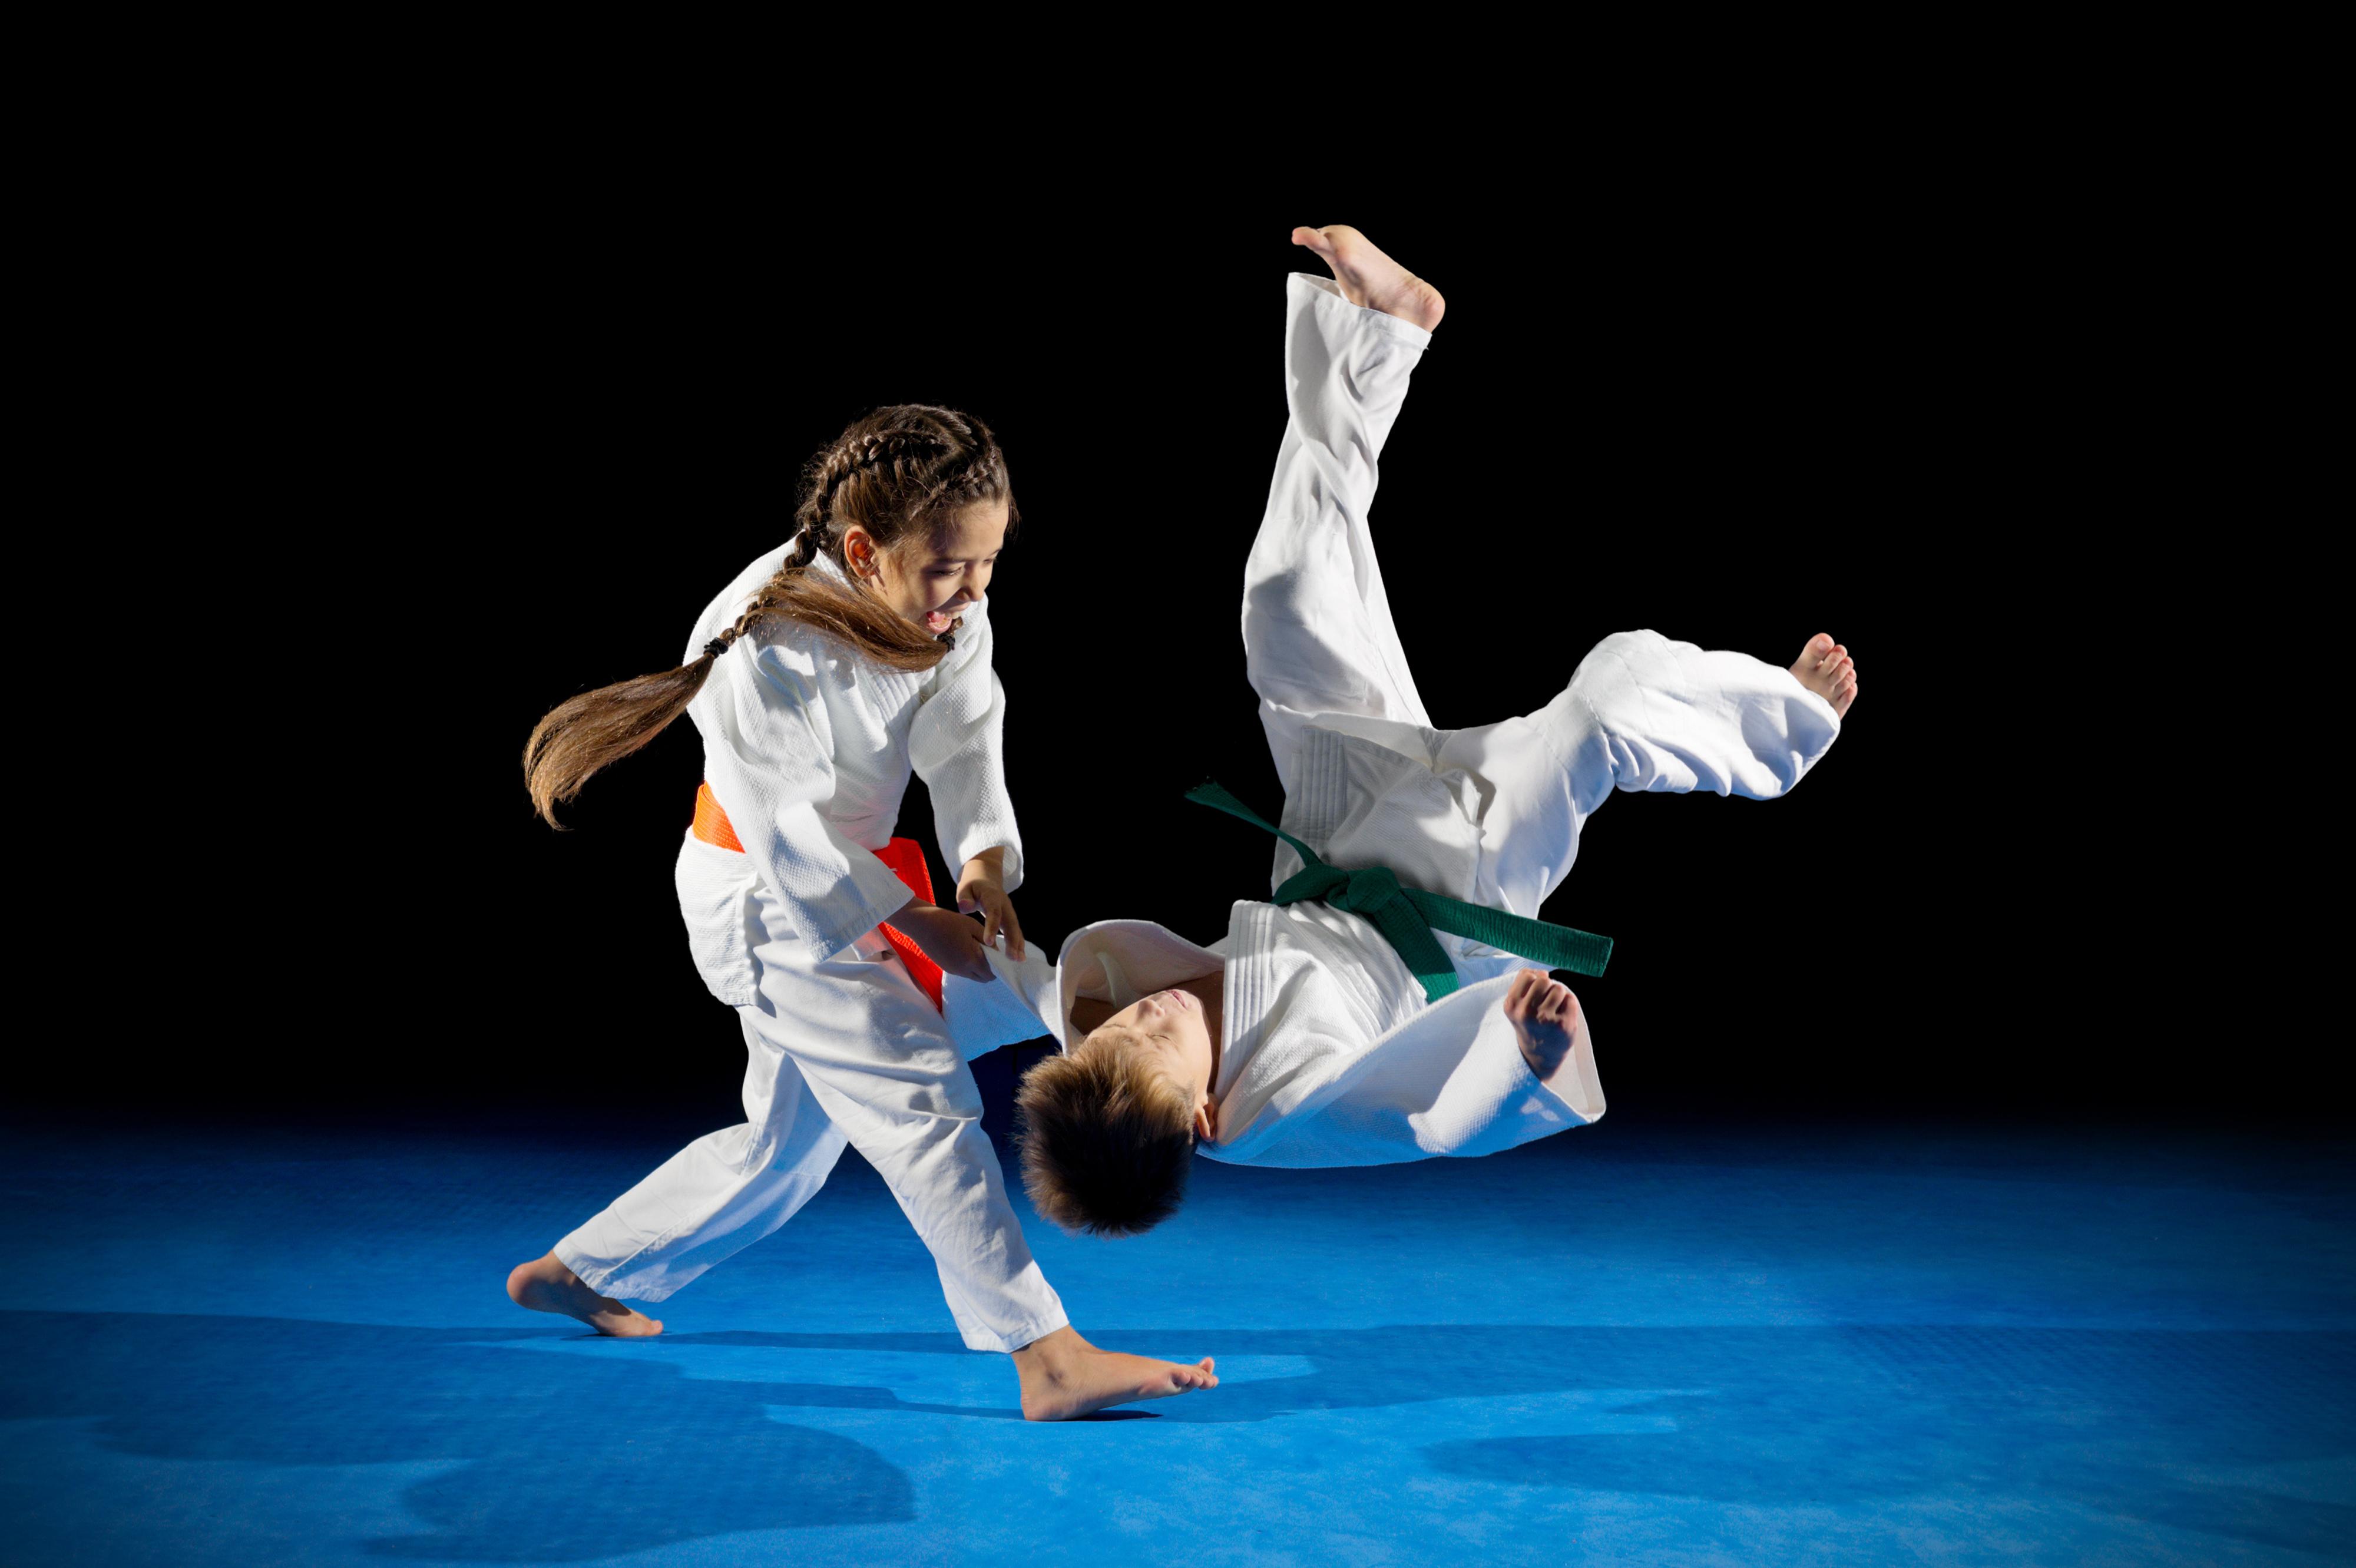 Kindertraining Kampfkunst Selbstverteidigung